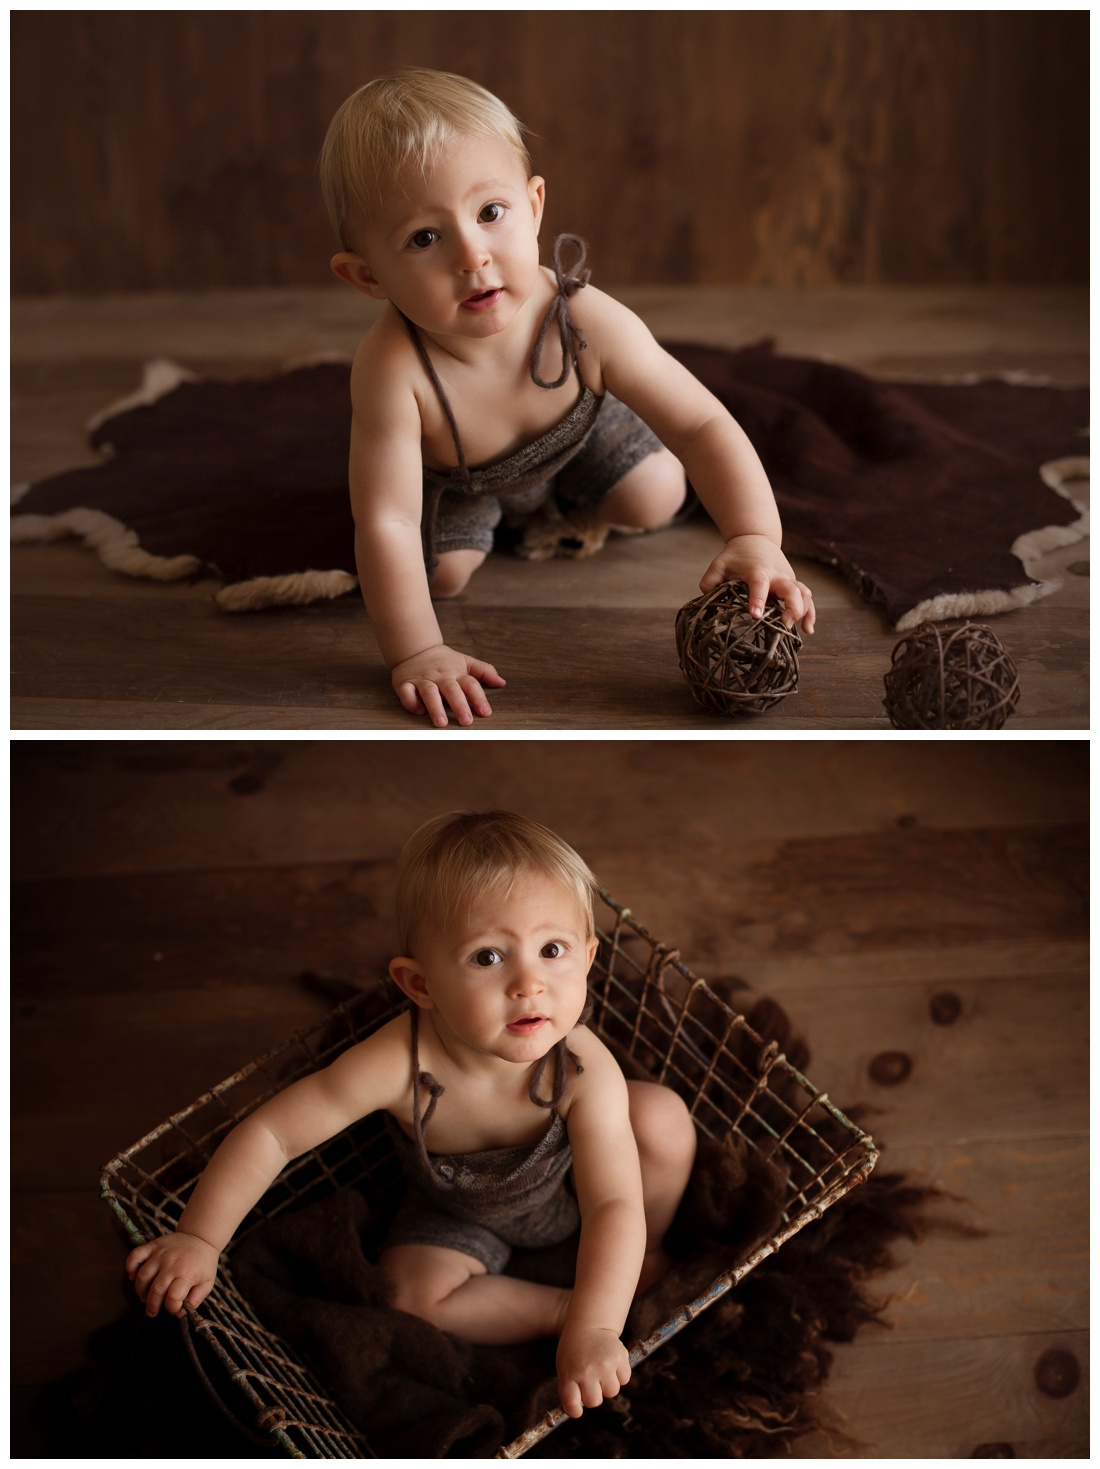 fotografo bambini_0009.jpg